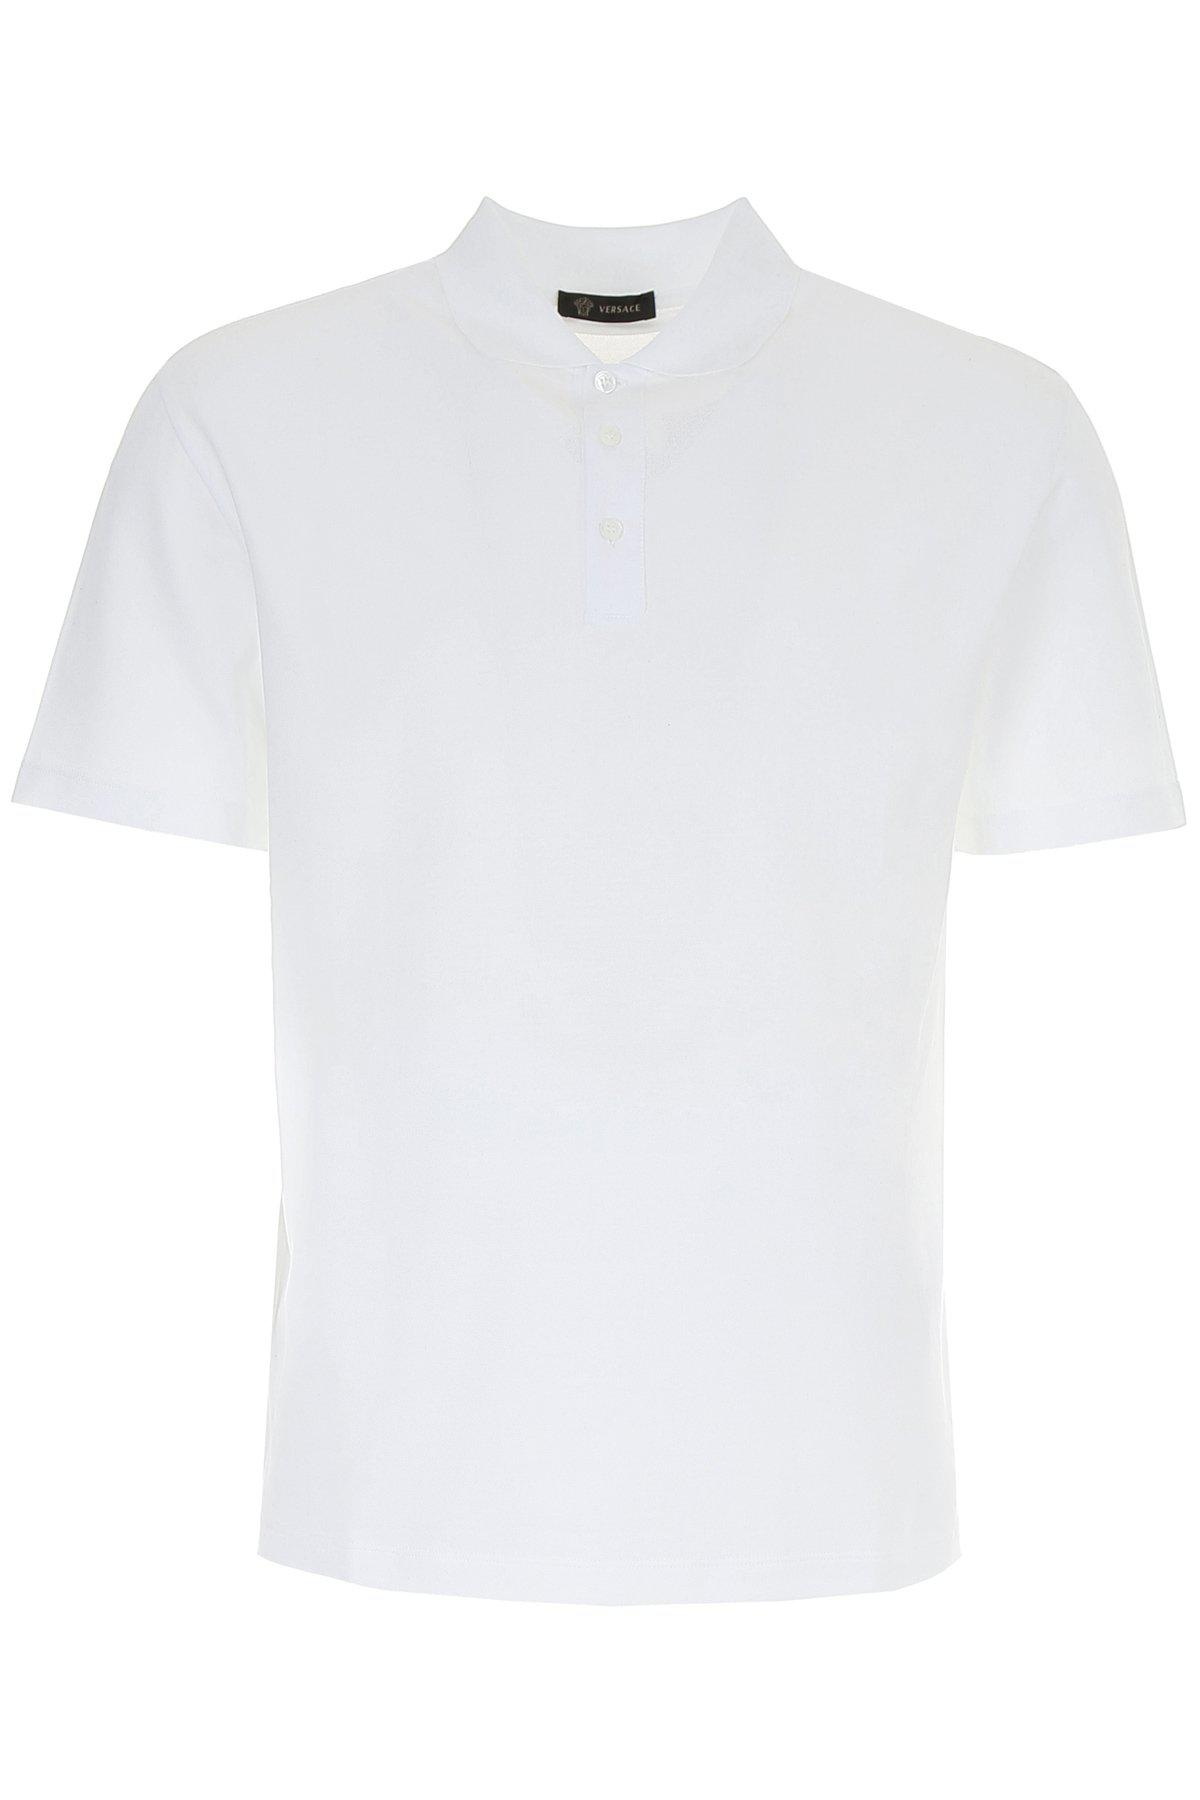 6651839a Versace - White 12 Polo Shirt for Men - Lyst. View fullscreen